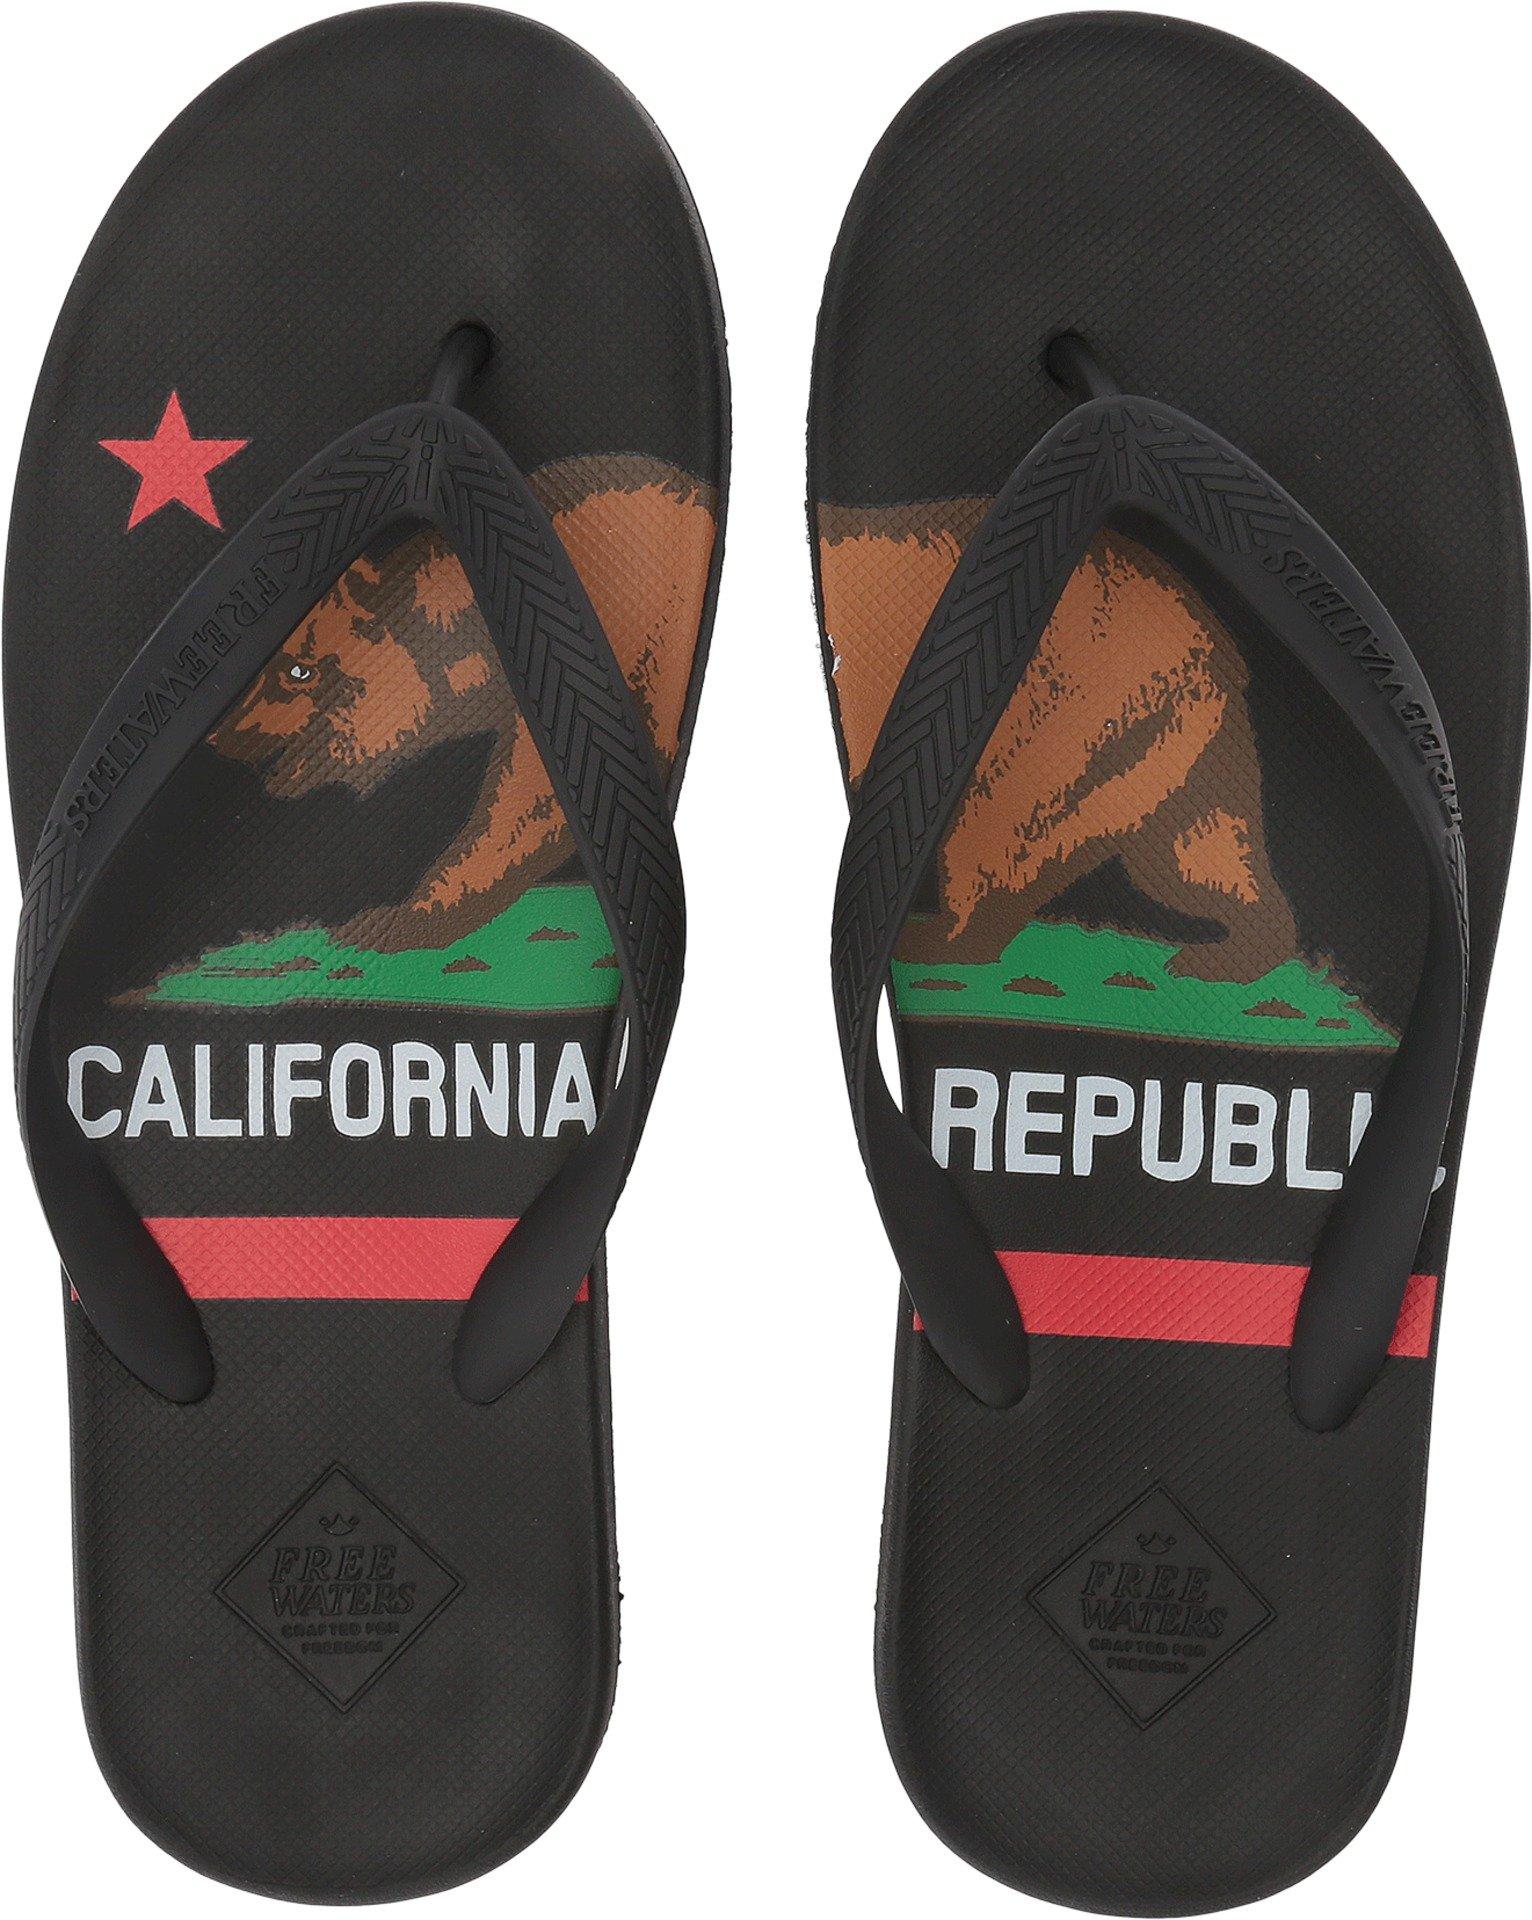 Freewaters Men's Archie Lightweight Vegan Water-Friendly Flip Flop Arch Support Geta and Zori Sandal, California Dreamin, 10 Medium US